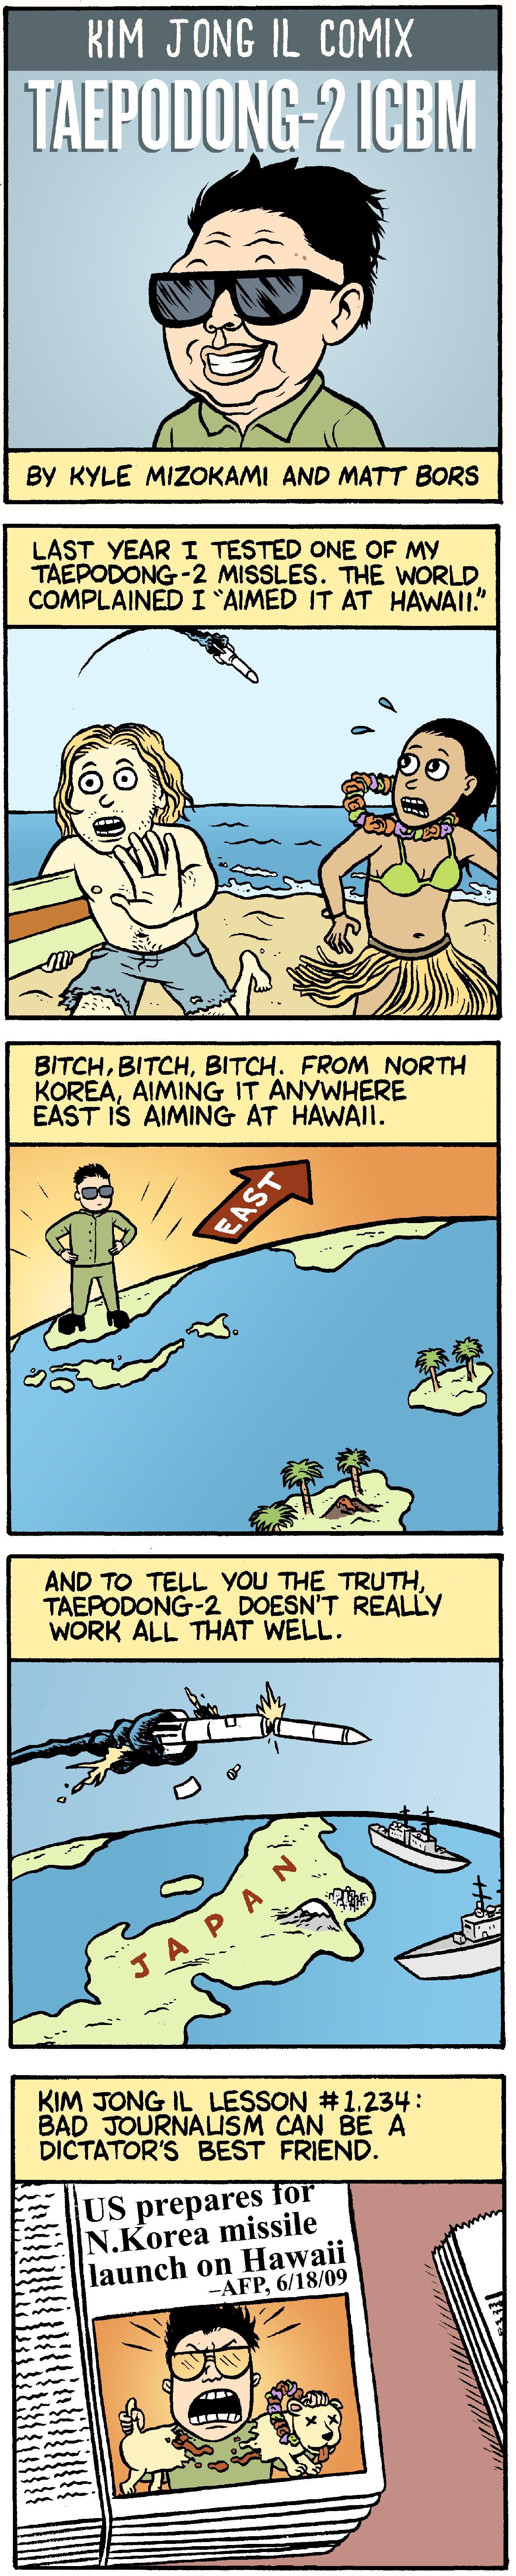 Kim Jong Il Comix #3